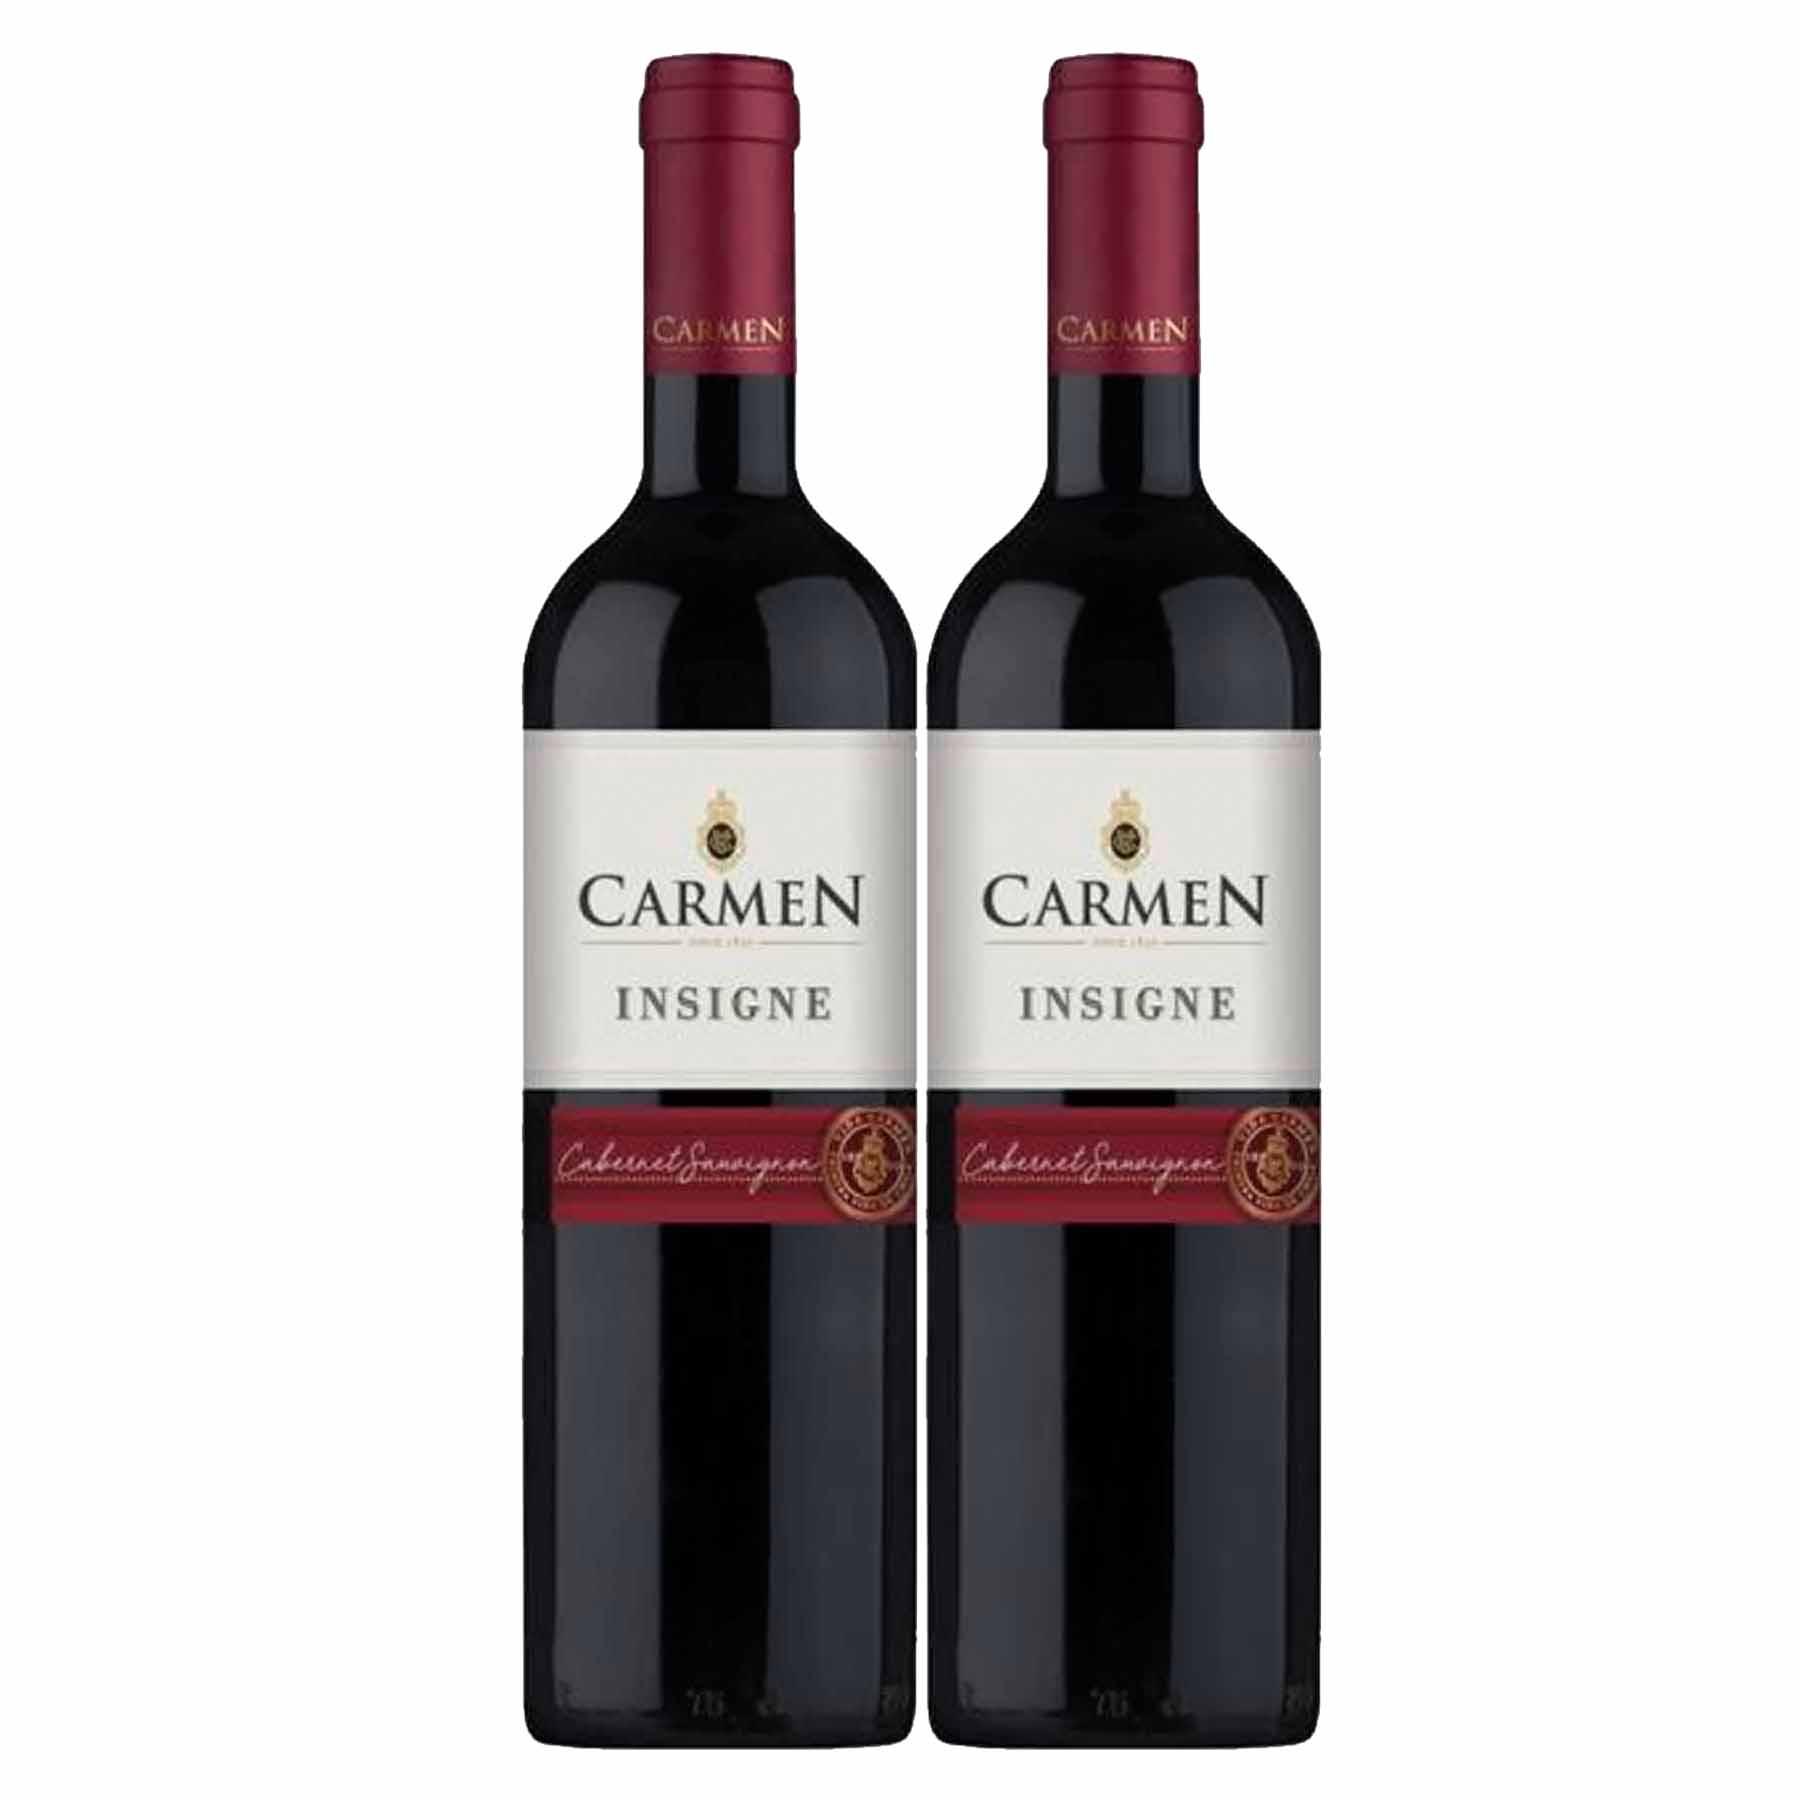 Kit 2x Vinho Tinto Chileno Carmen Insigne Cabernet Sauvignon 2018